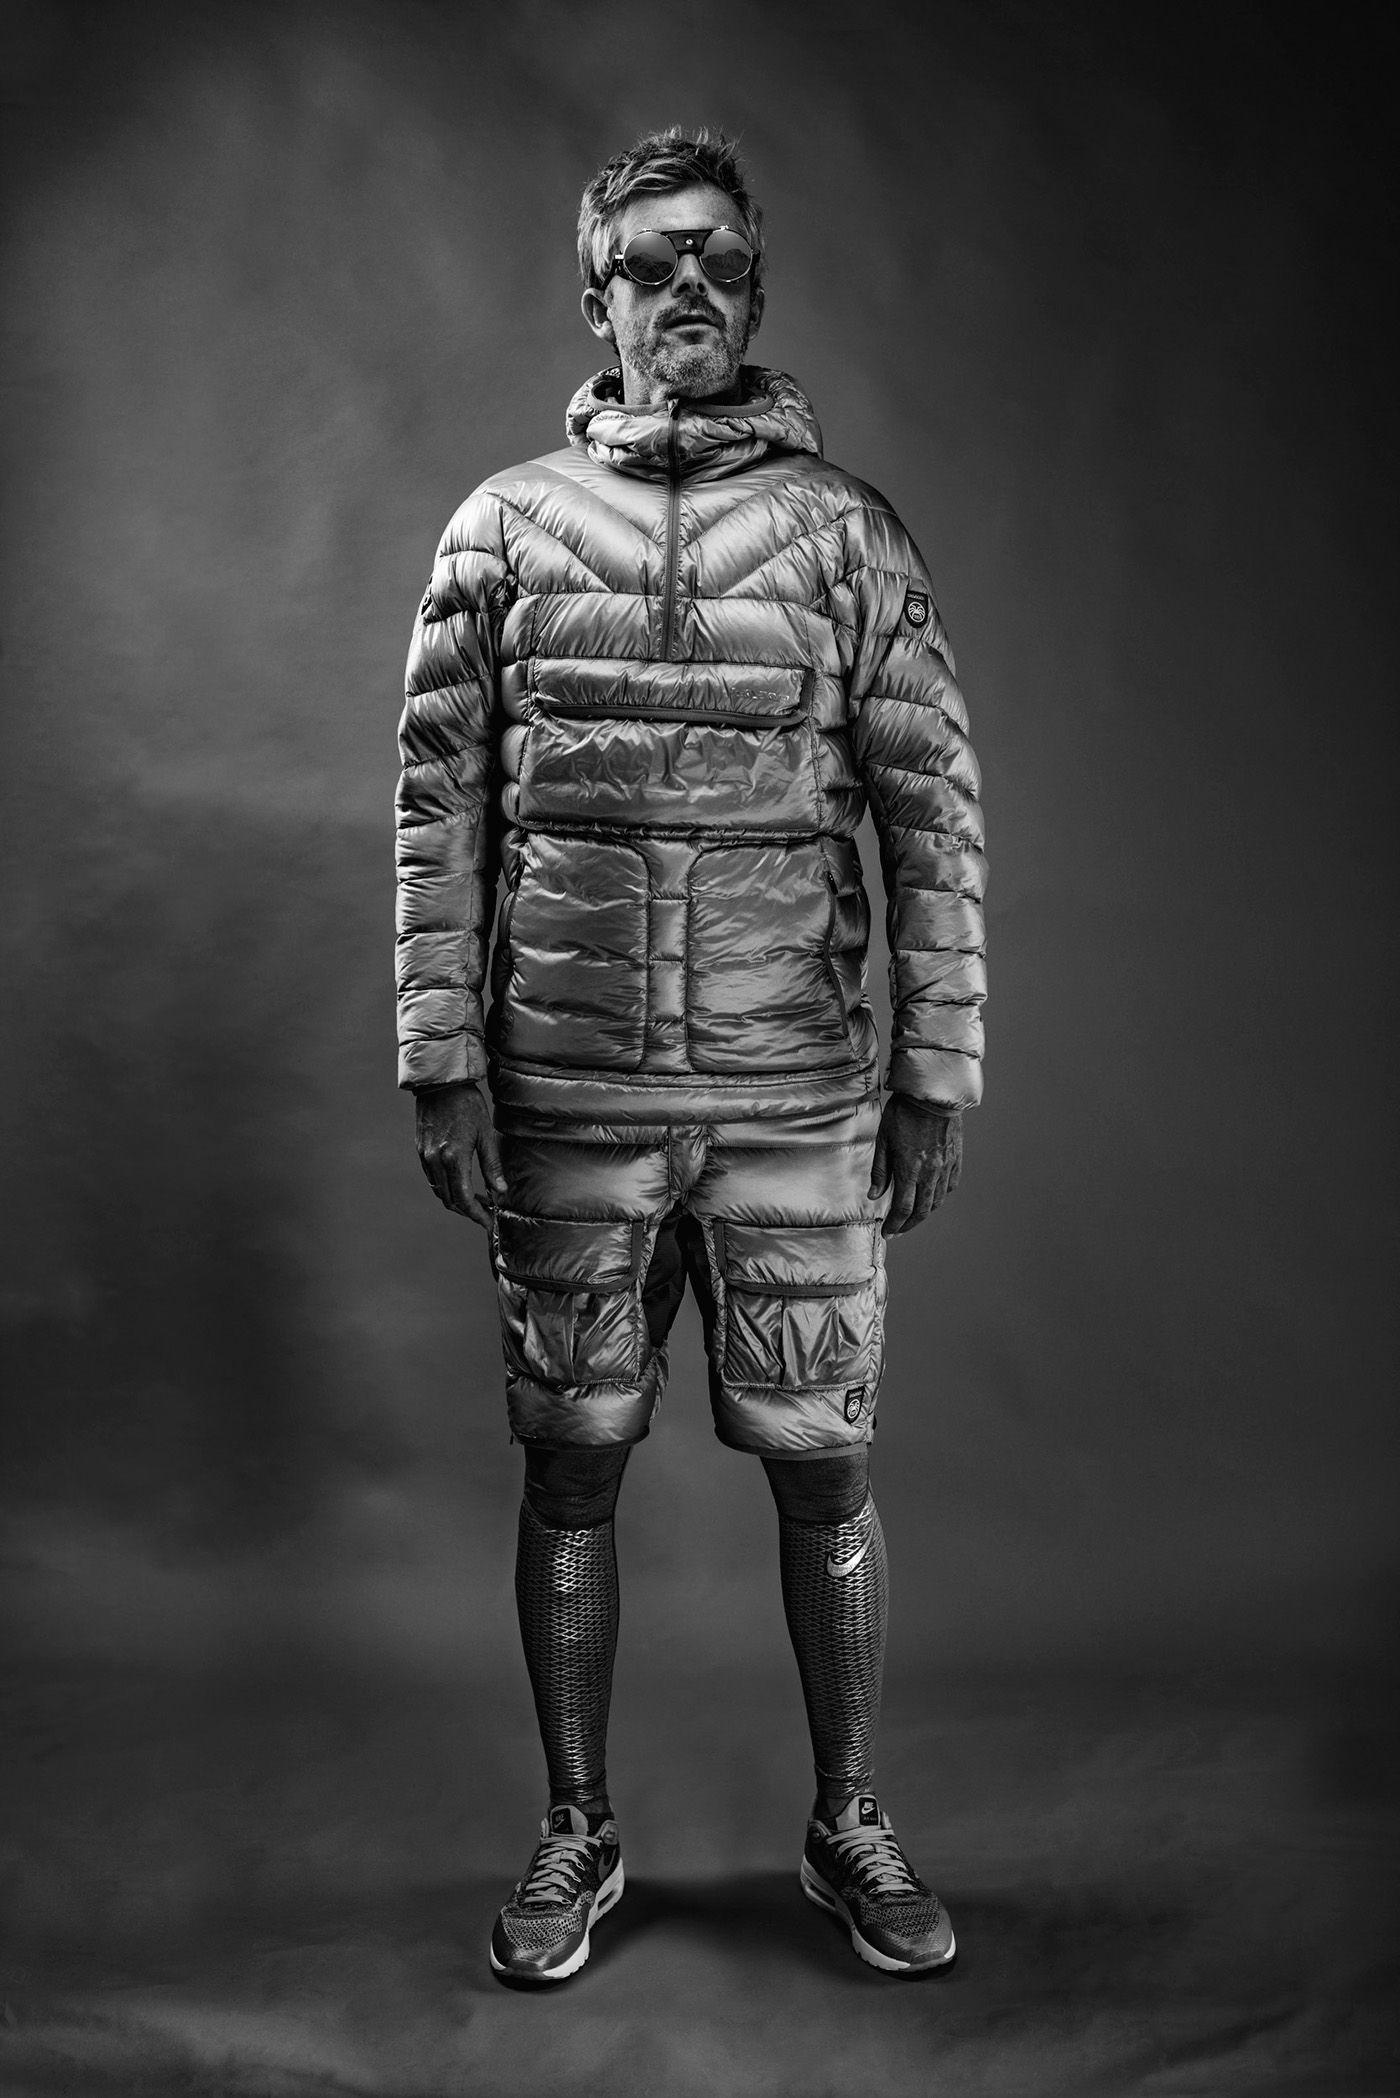 Pajak Sport Lange Lange Capsule Collectionpajak Sport And Lange Lange Design Present Limited Edition Capslule Collection Of Sports Winter Suit Superhero